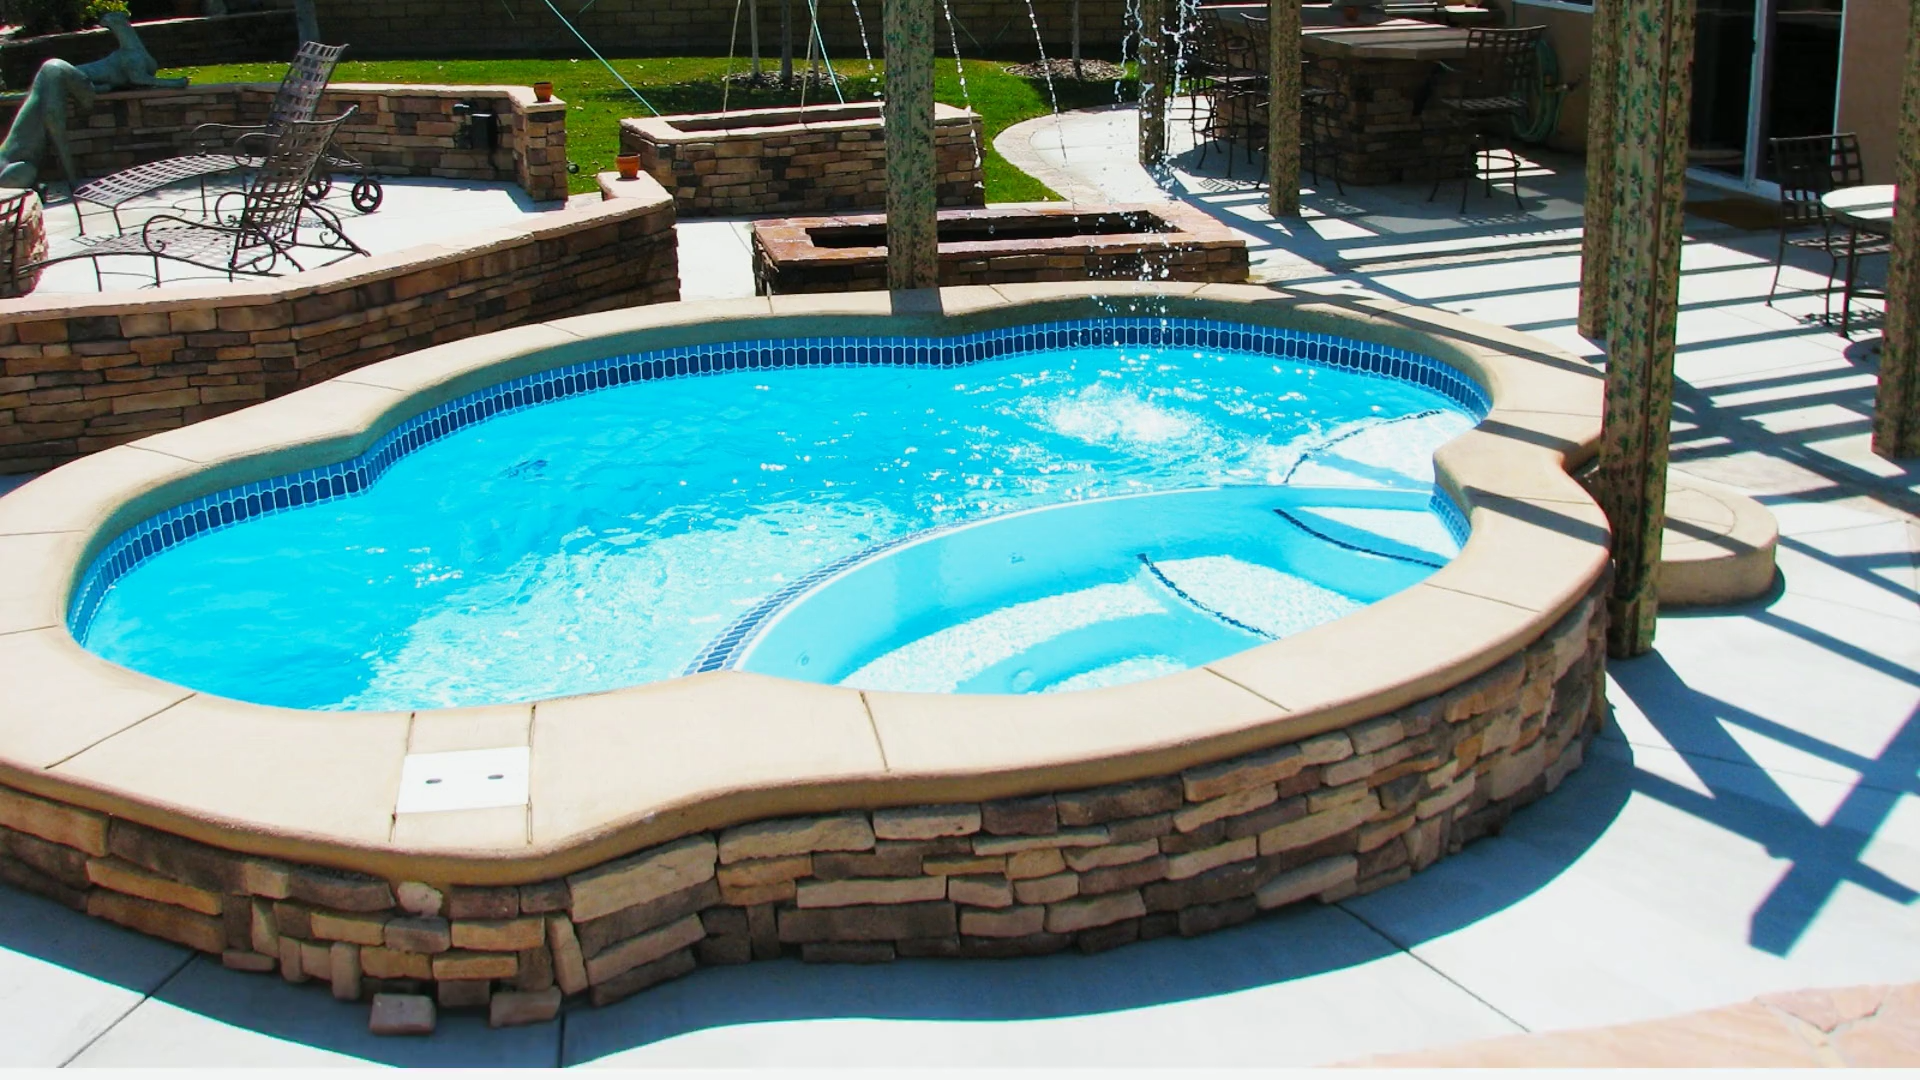 The Crystal Beach San Juan Pools San Juan Pools Swimming Pool Landscaping Best Above Ground Pool